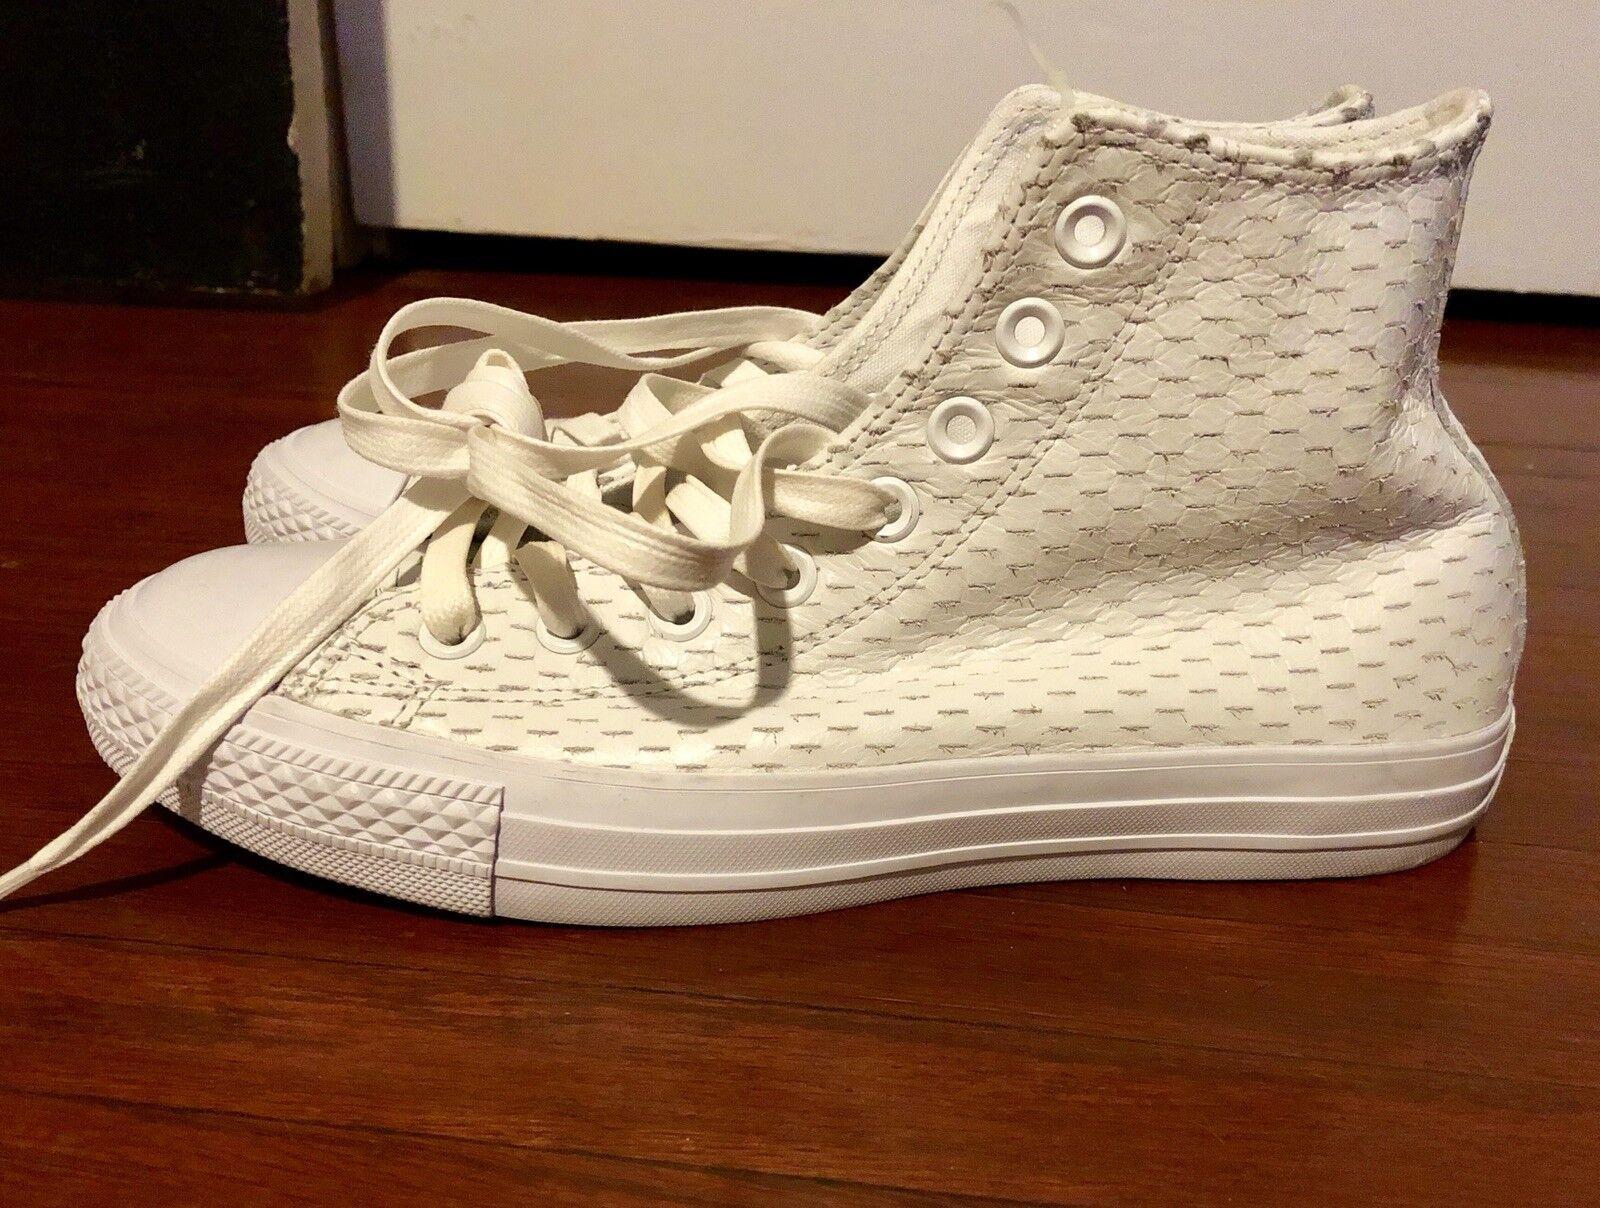 New Mens 6.5 Women's 8.5 Converse CTAS Hi White gold Leather shoes  75 153115C